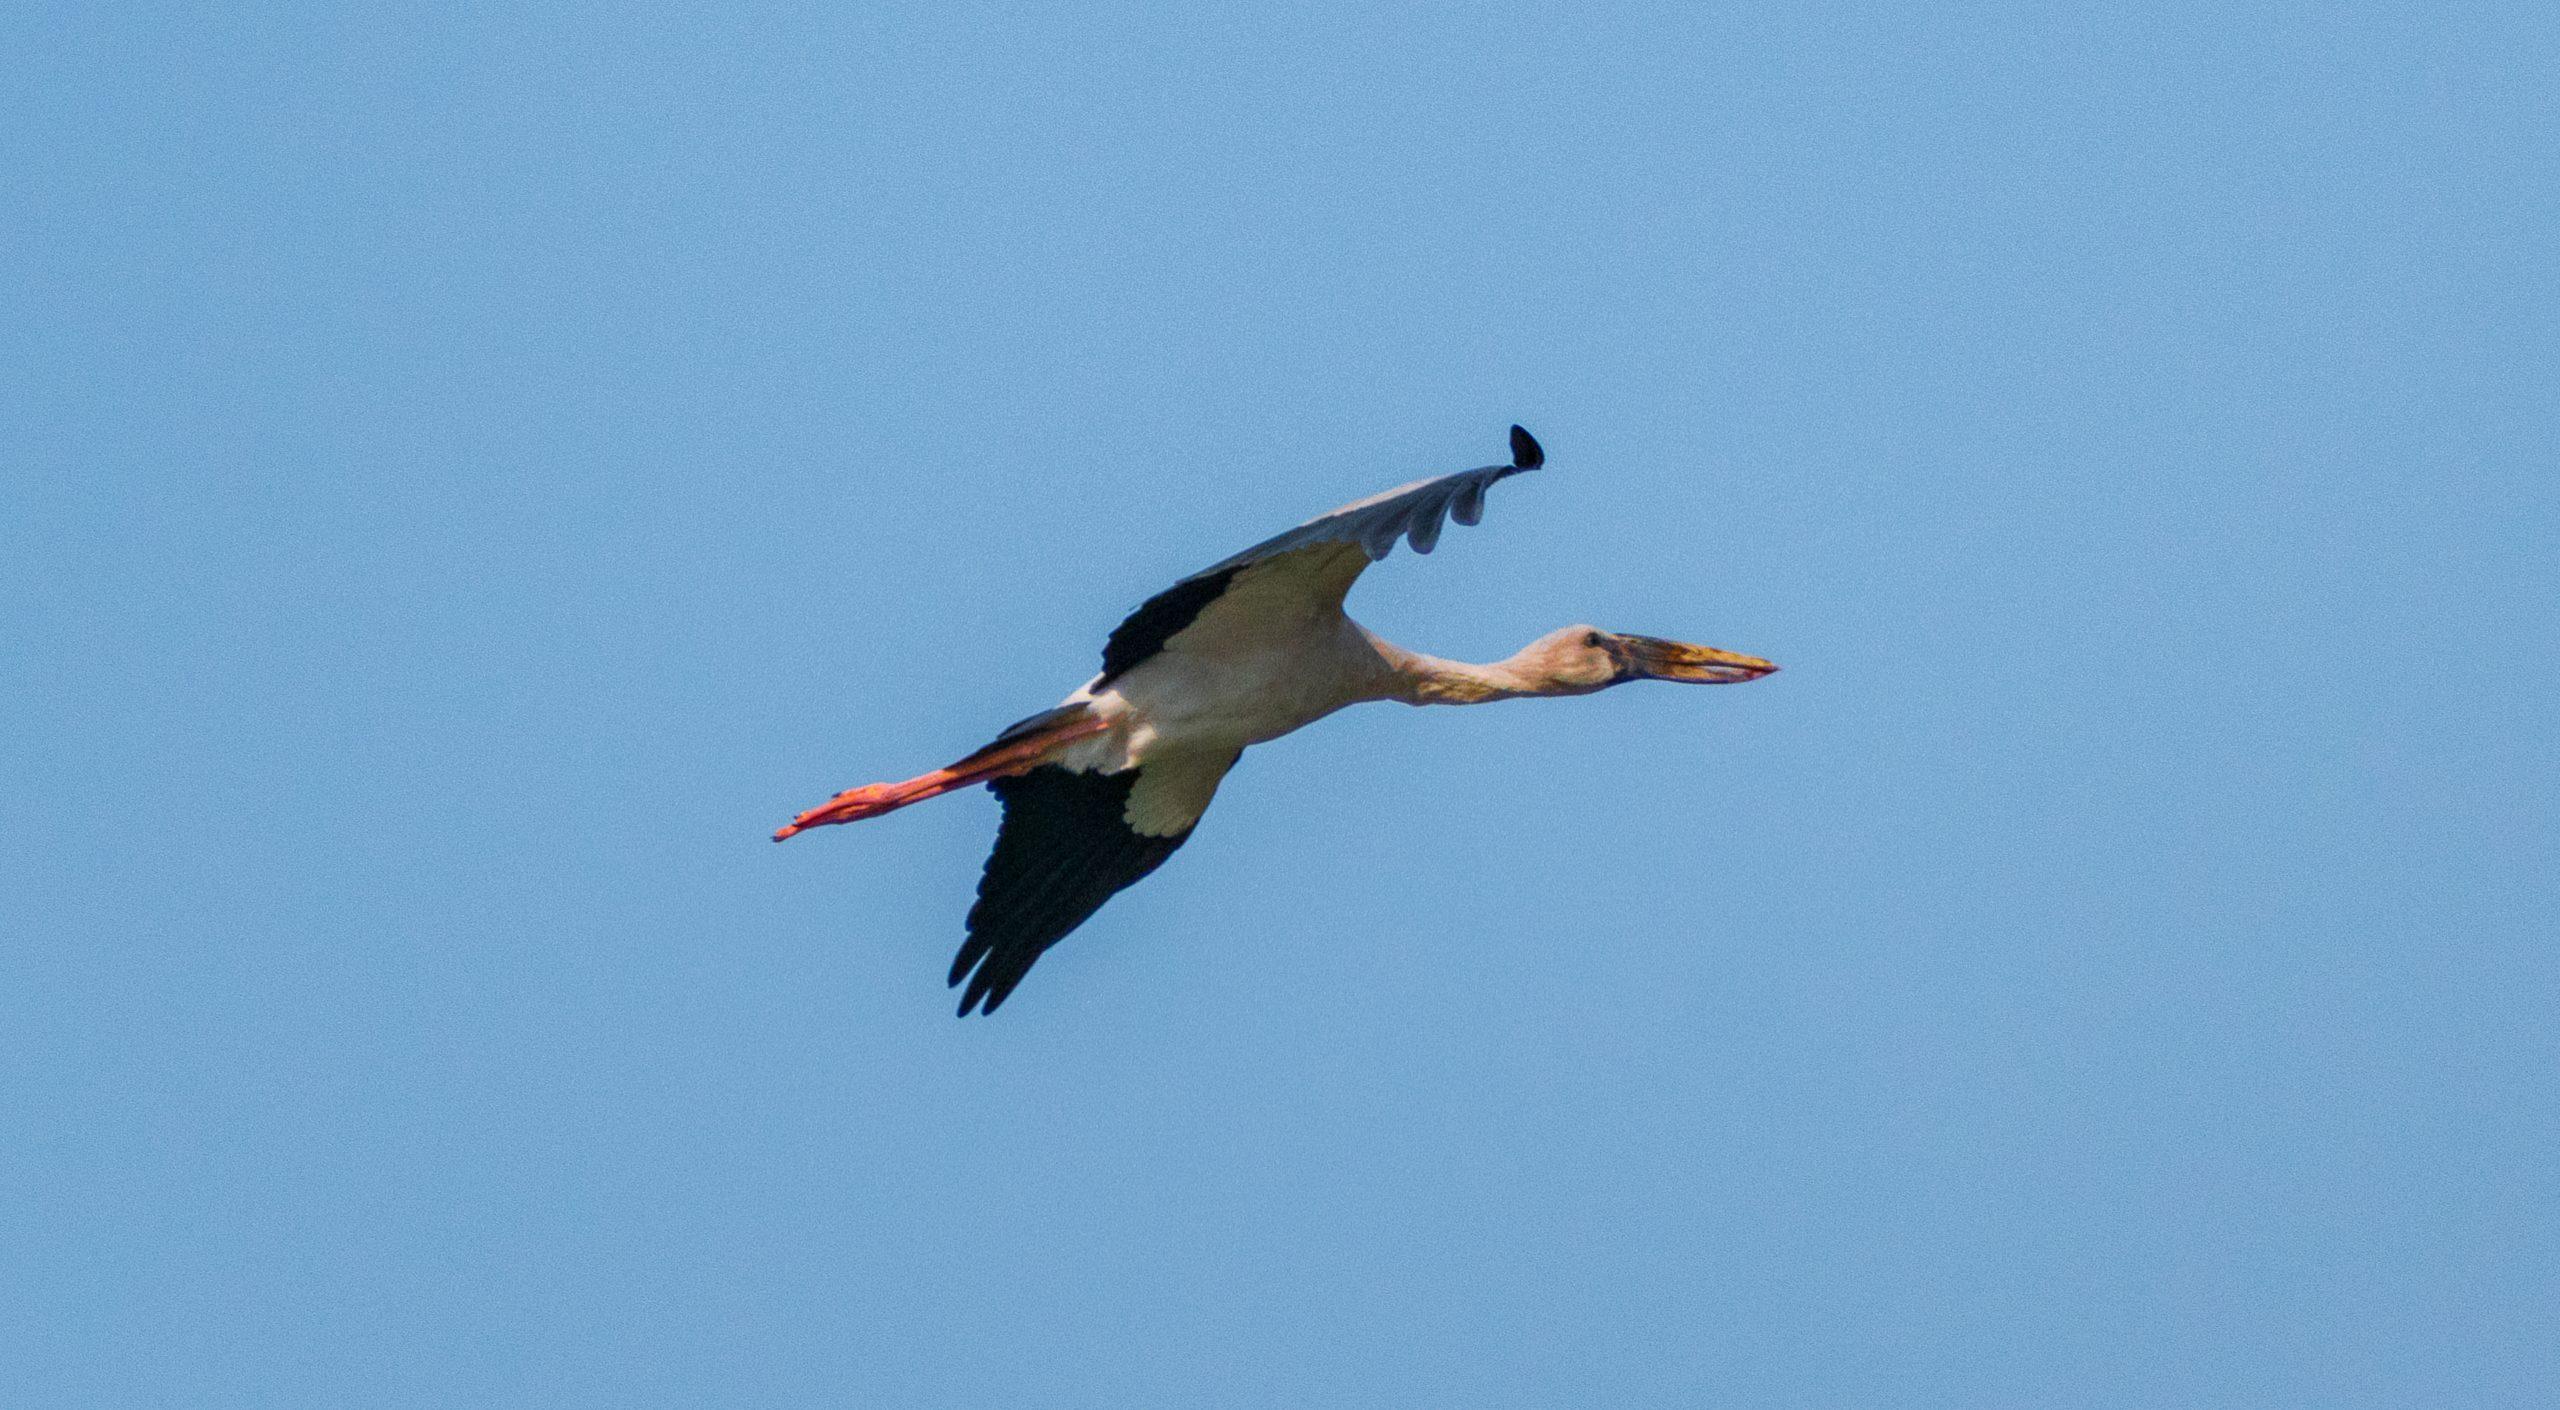 A flying Asian openbill stork